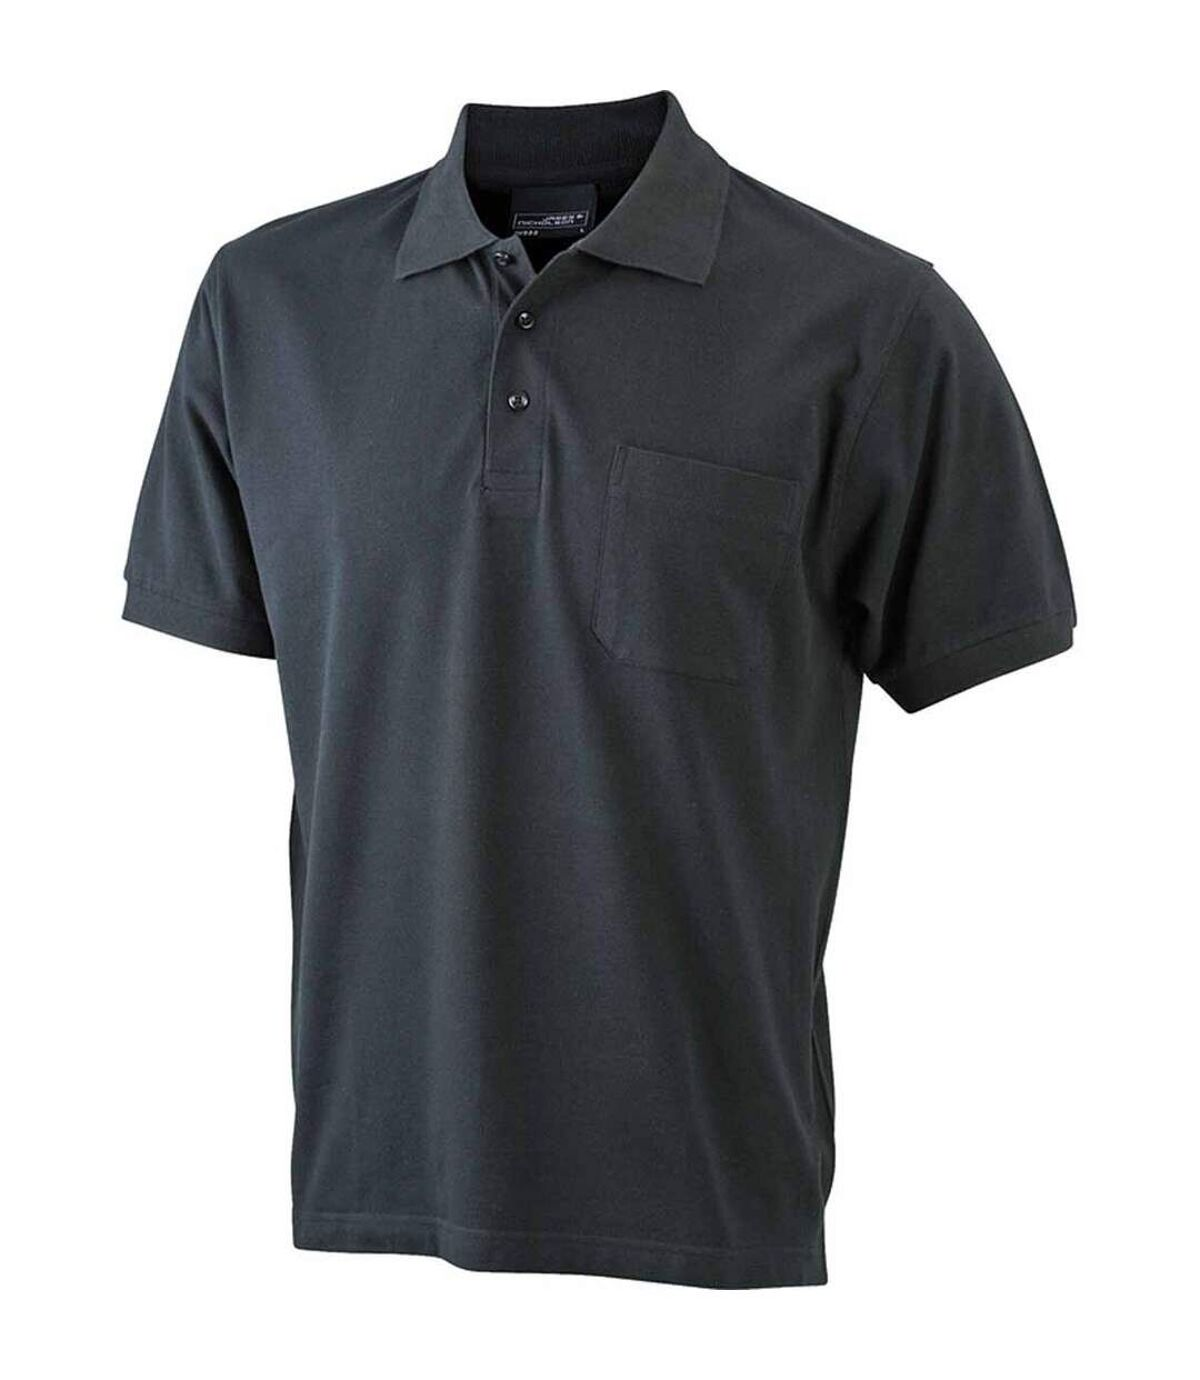 Polo manches courtes poche poitrine HOMME JN922 - noir